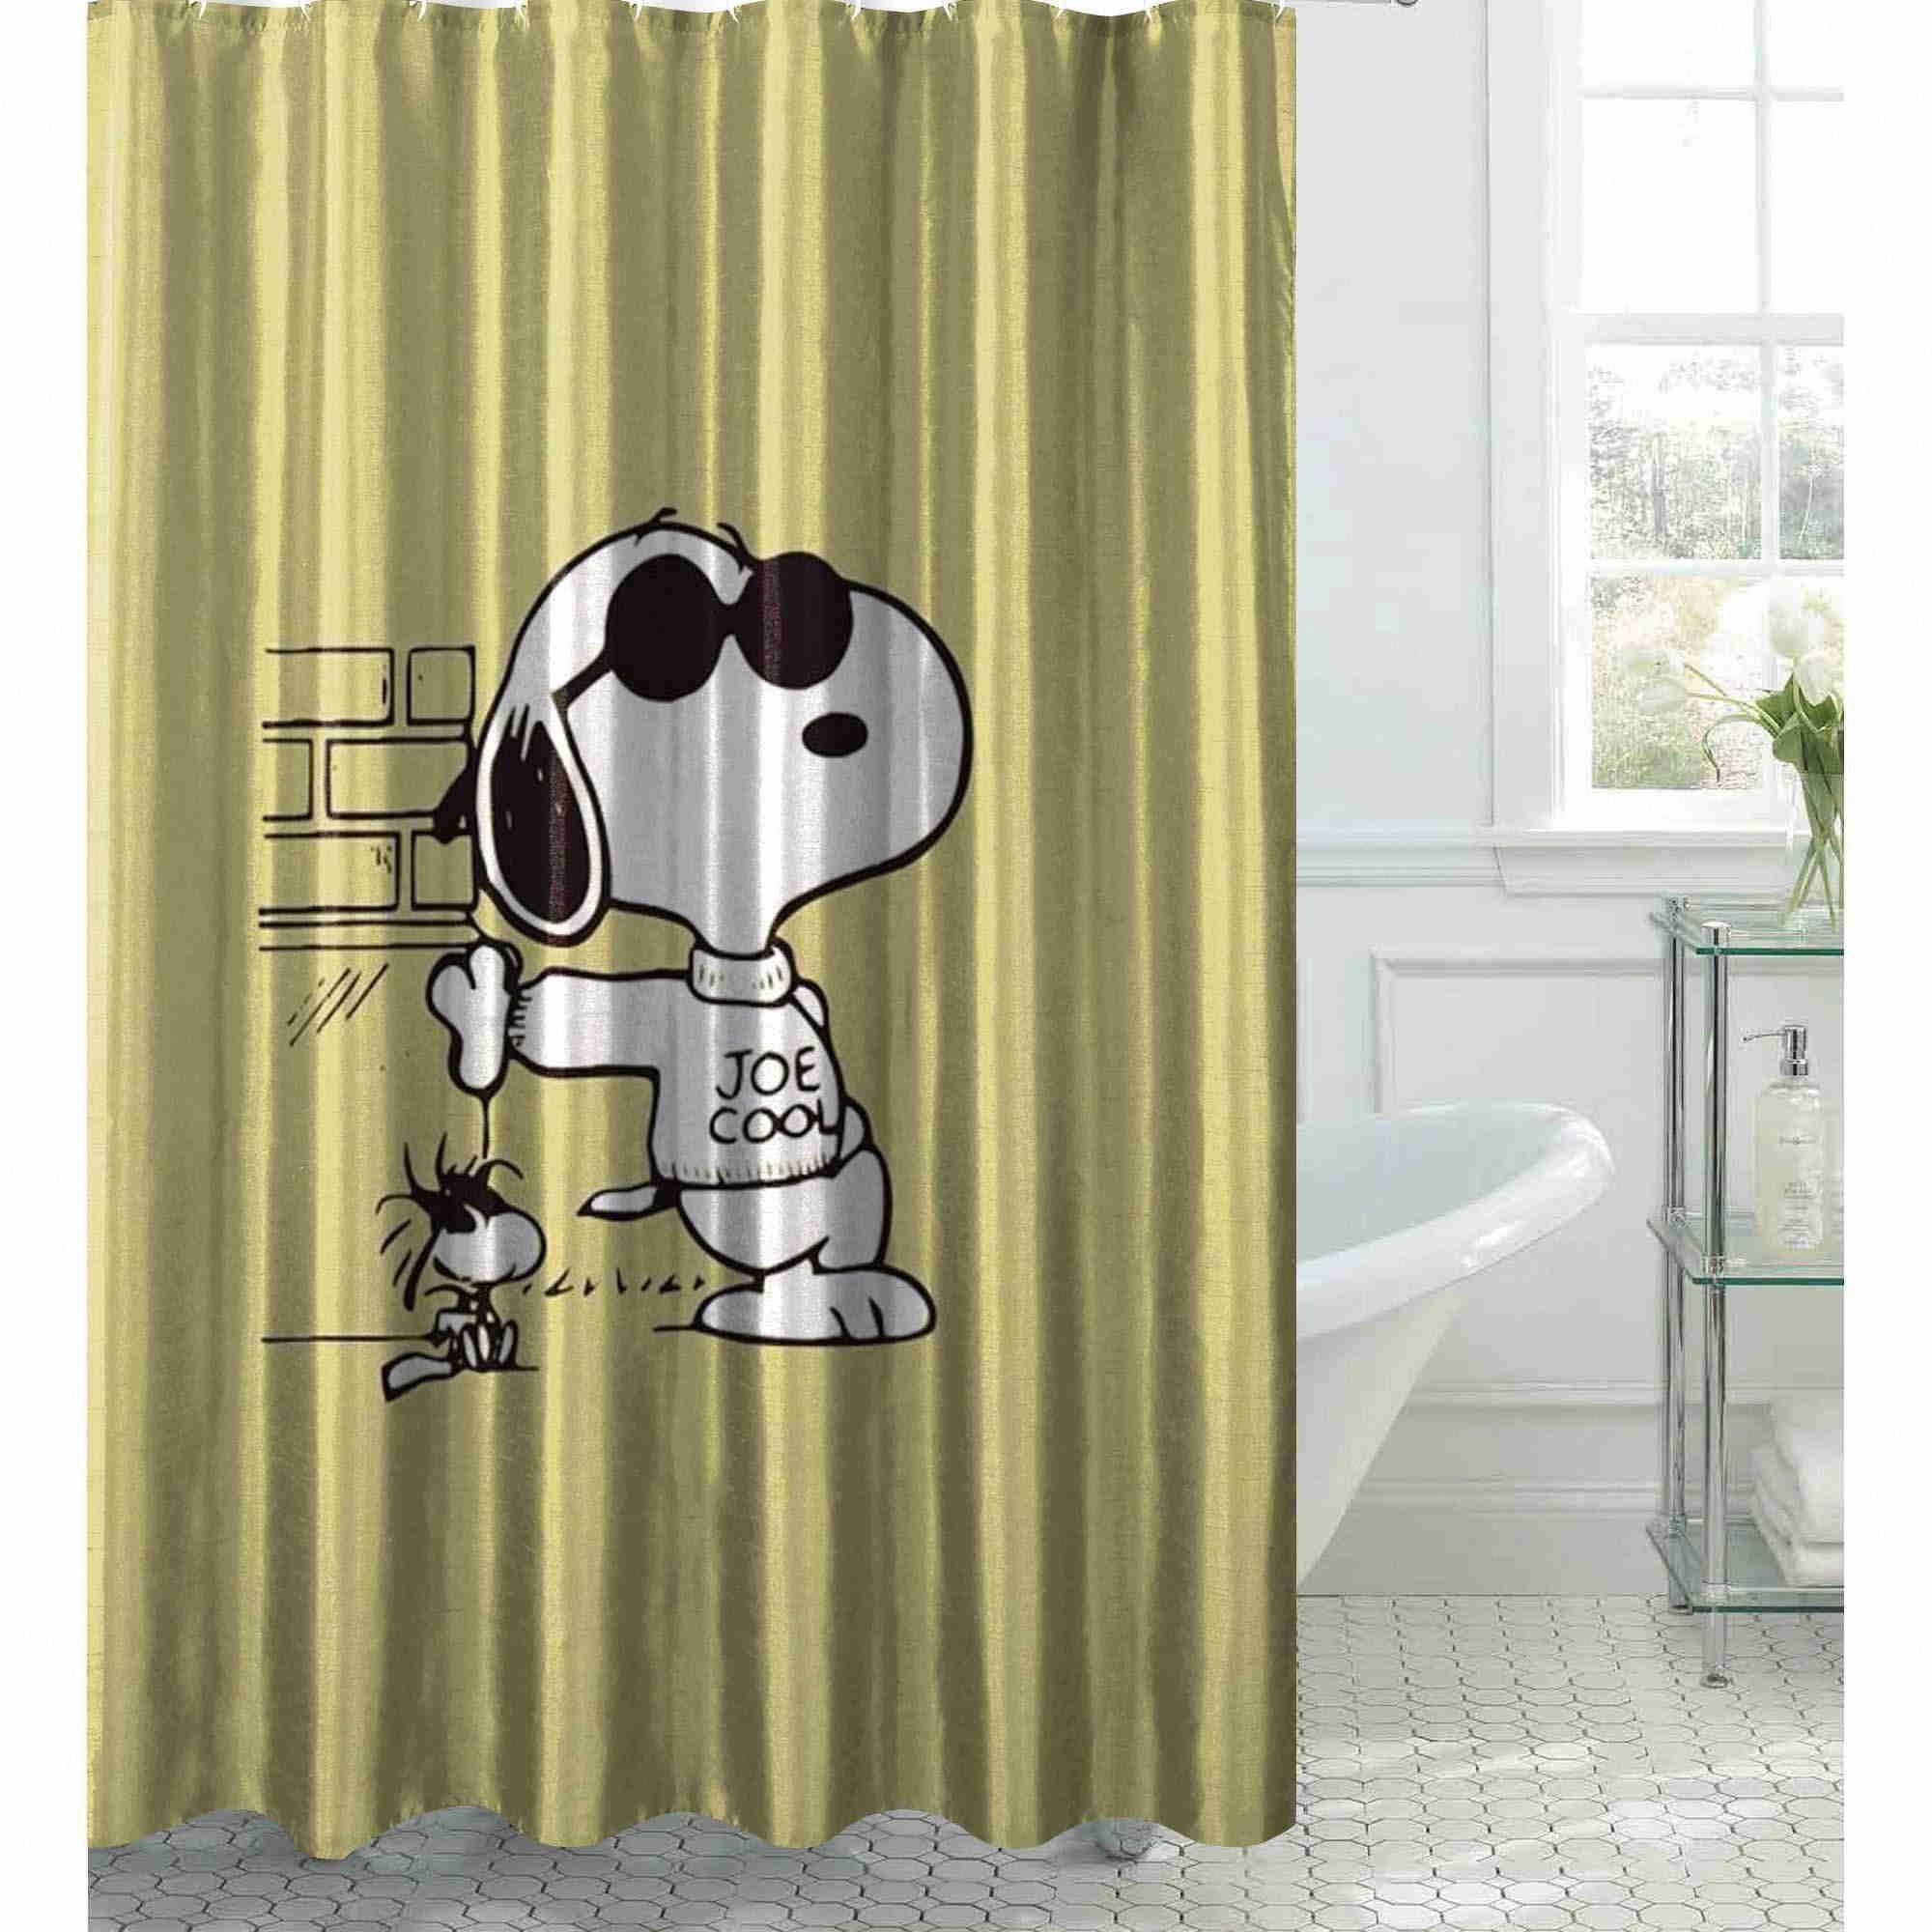 Snoopy fictional cartoon characters bathroom shower curtain